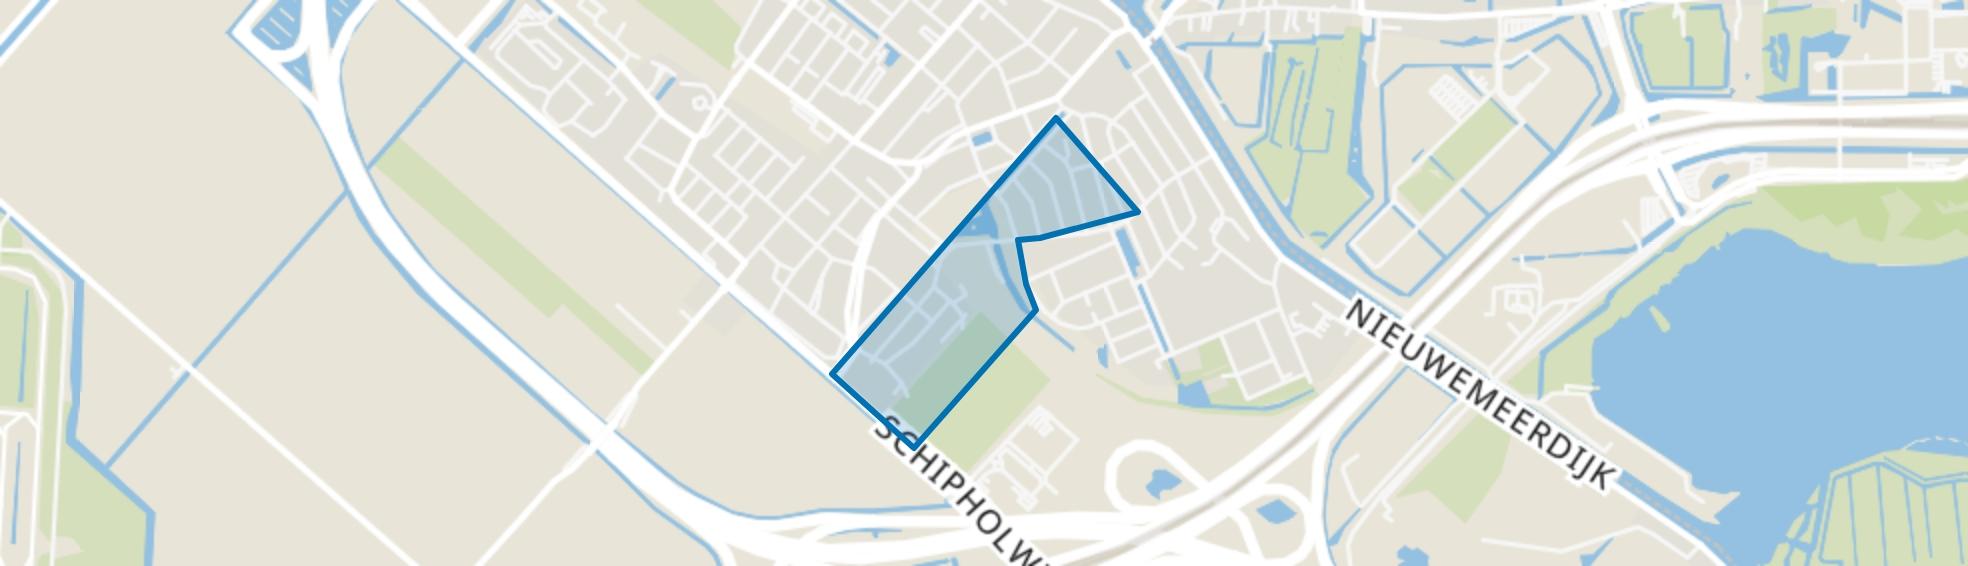 Badhoevedorp Oost, Badhoevedorp map